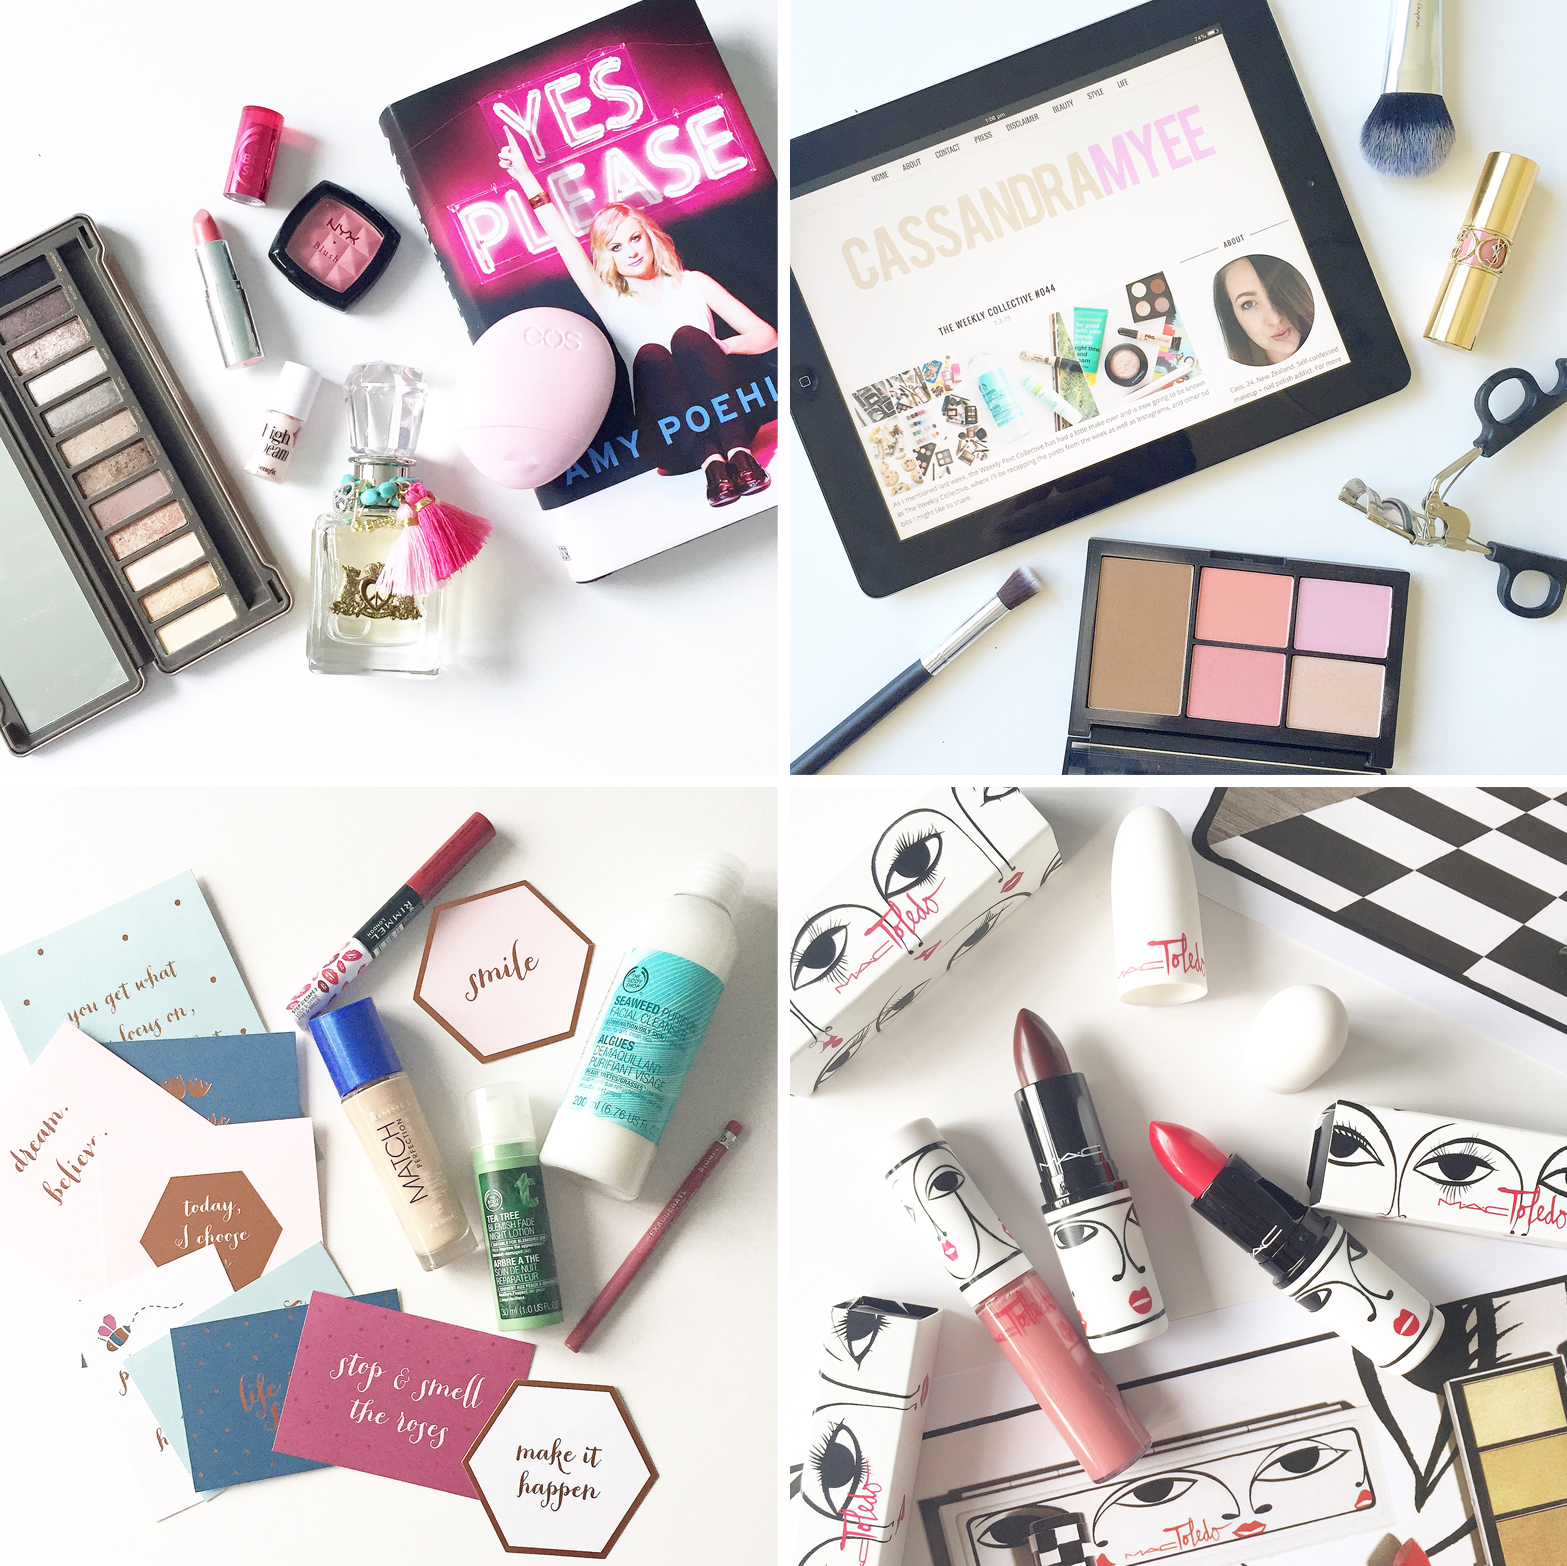 THE WEEKLY COLLECTIVE #045 | Posts + Instagram - CassandraMyee